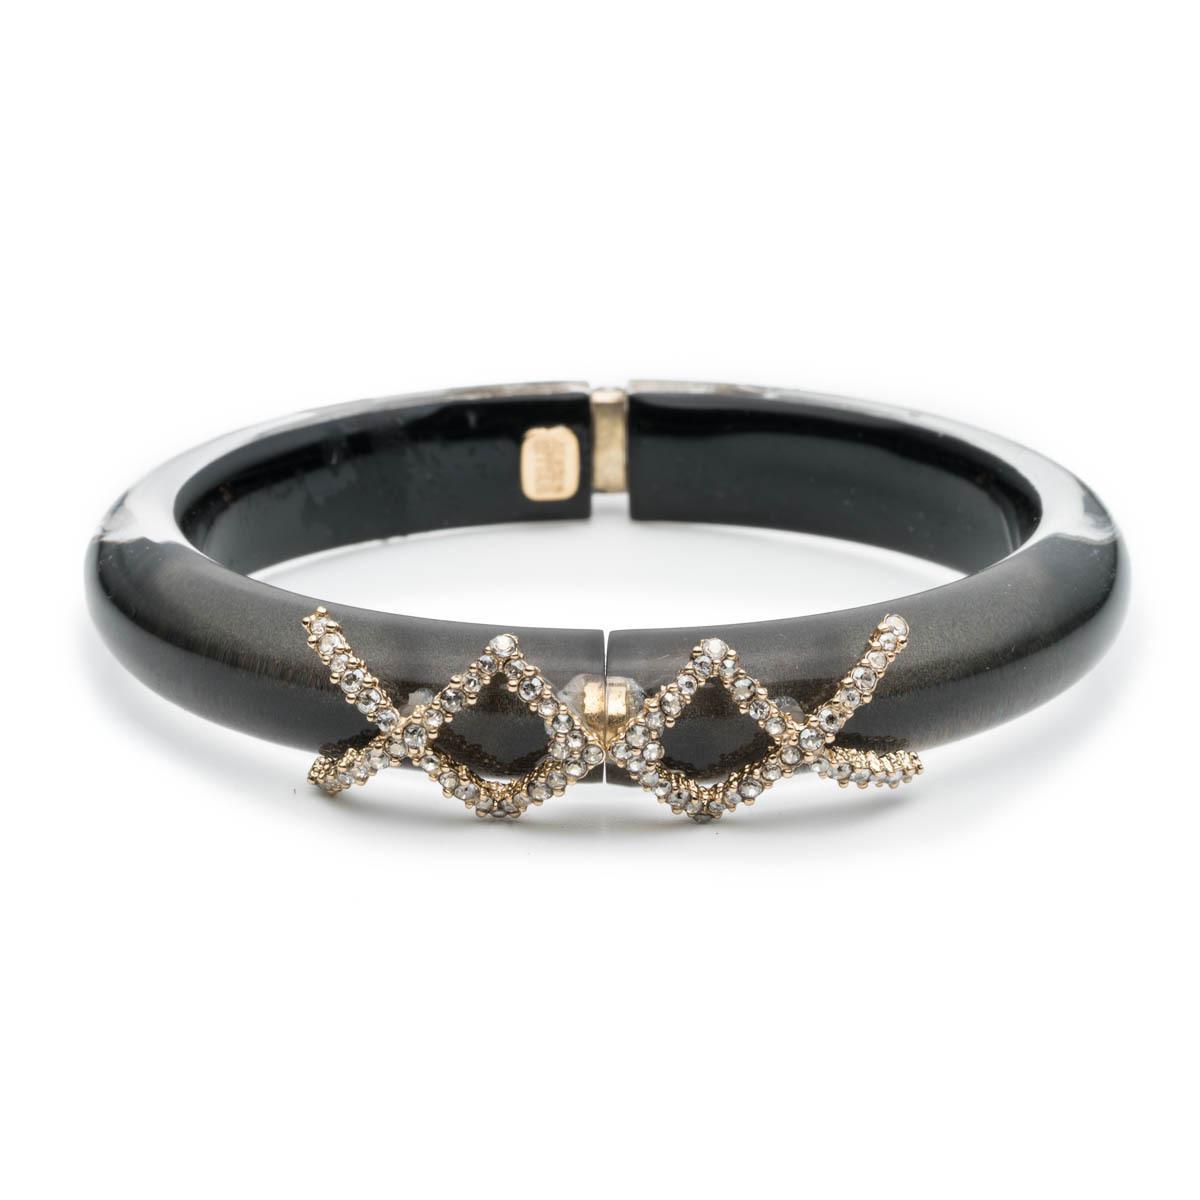 Alexis Bittar Petite Raffia Hinge Bracelet Silver prUCndw3